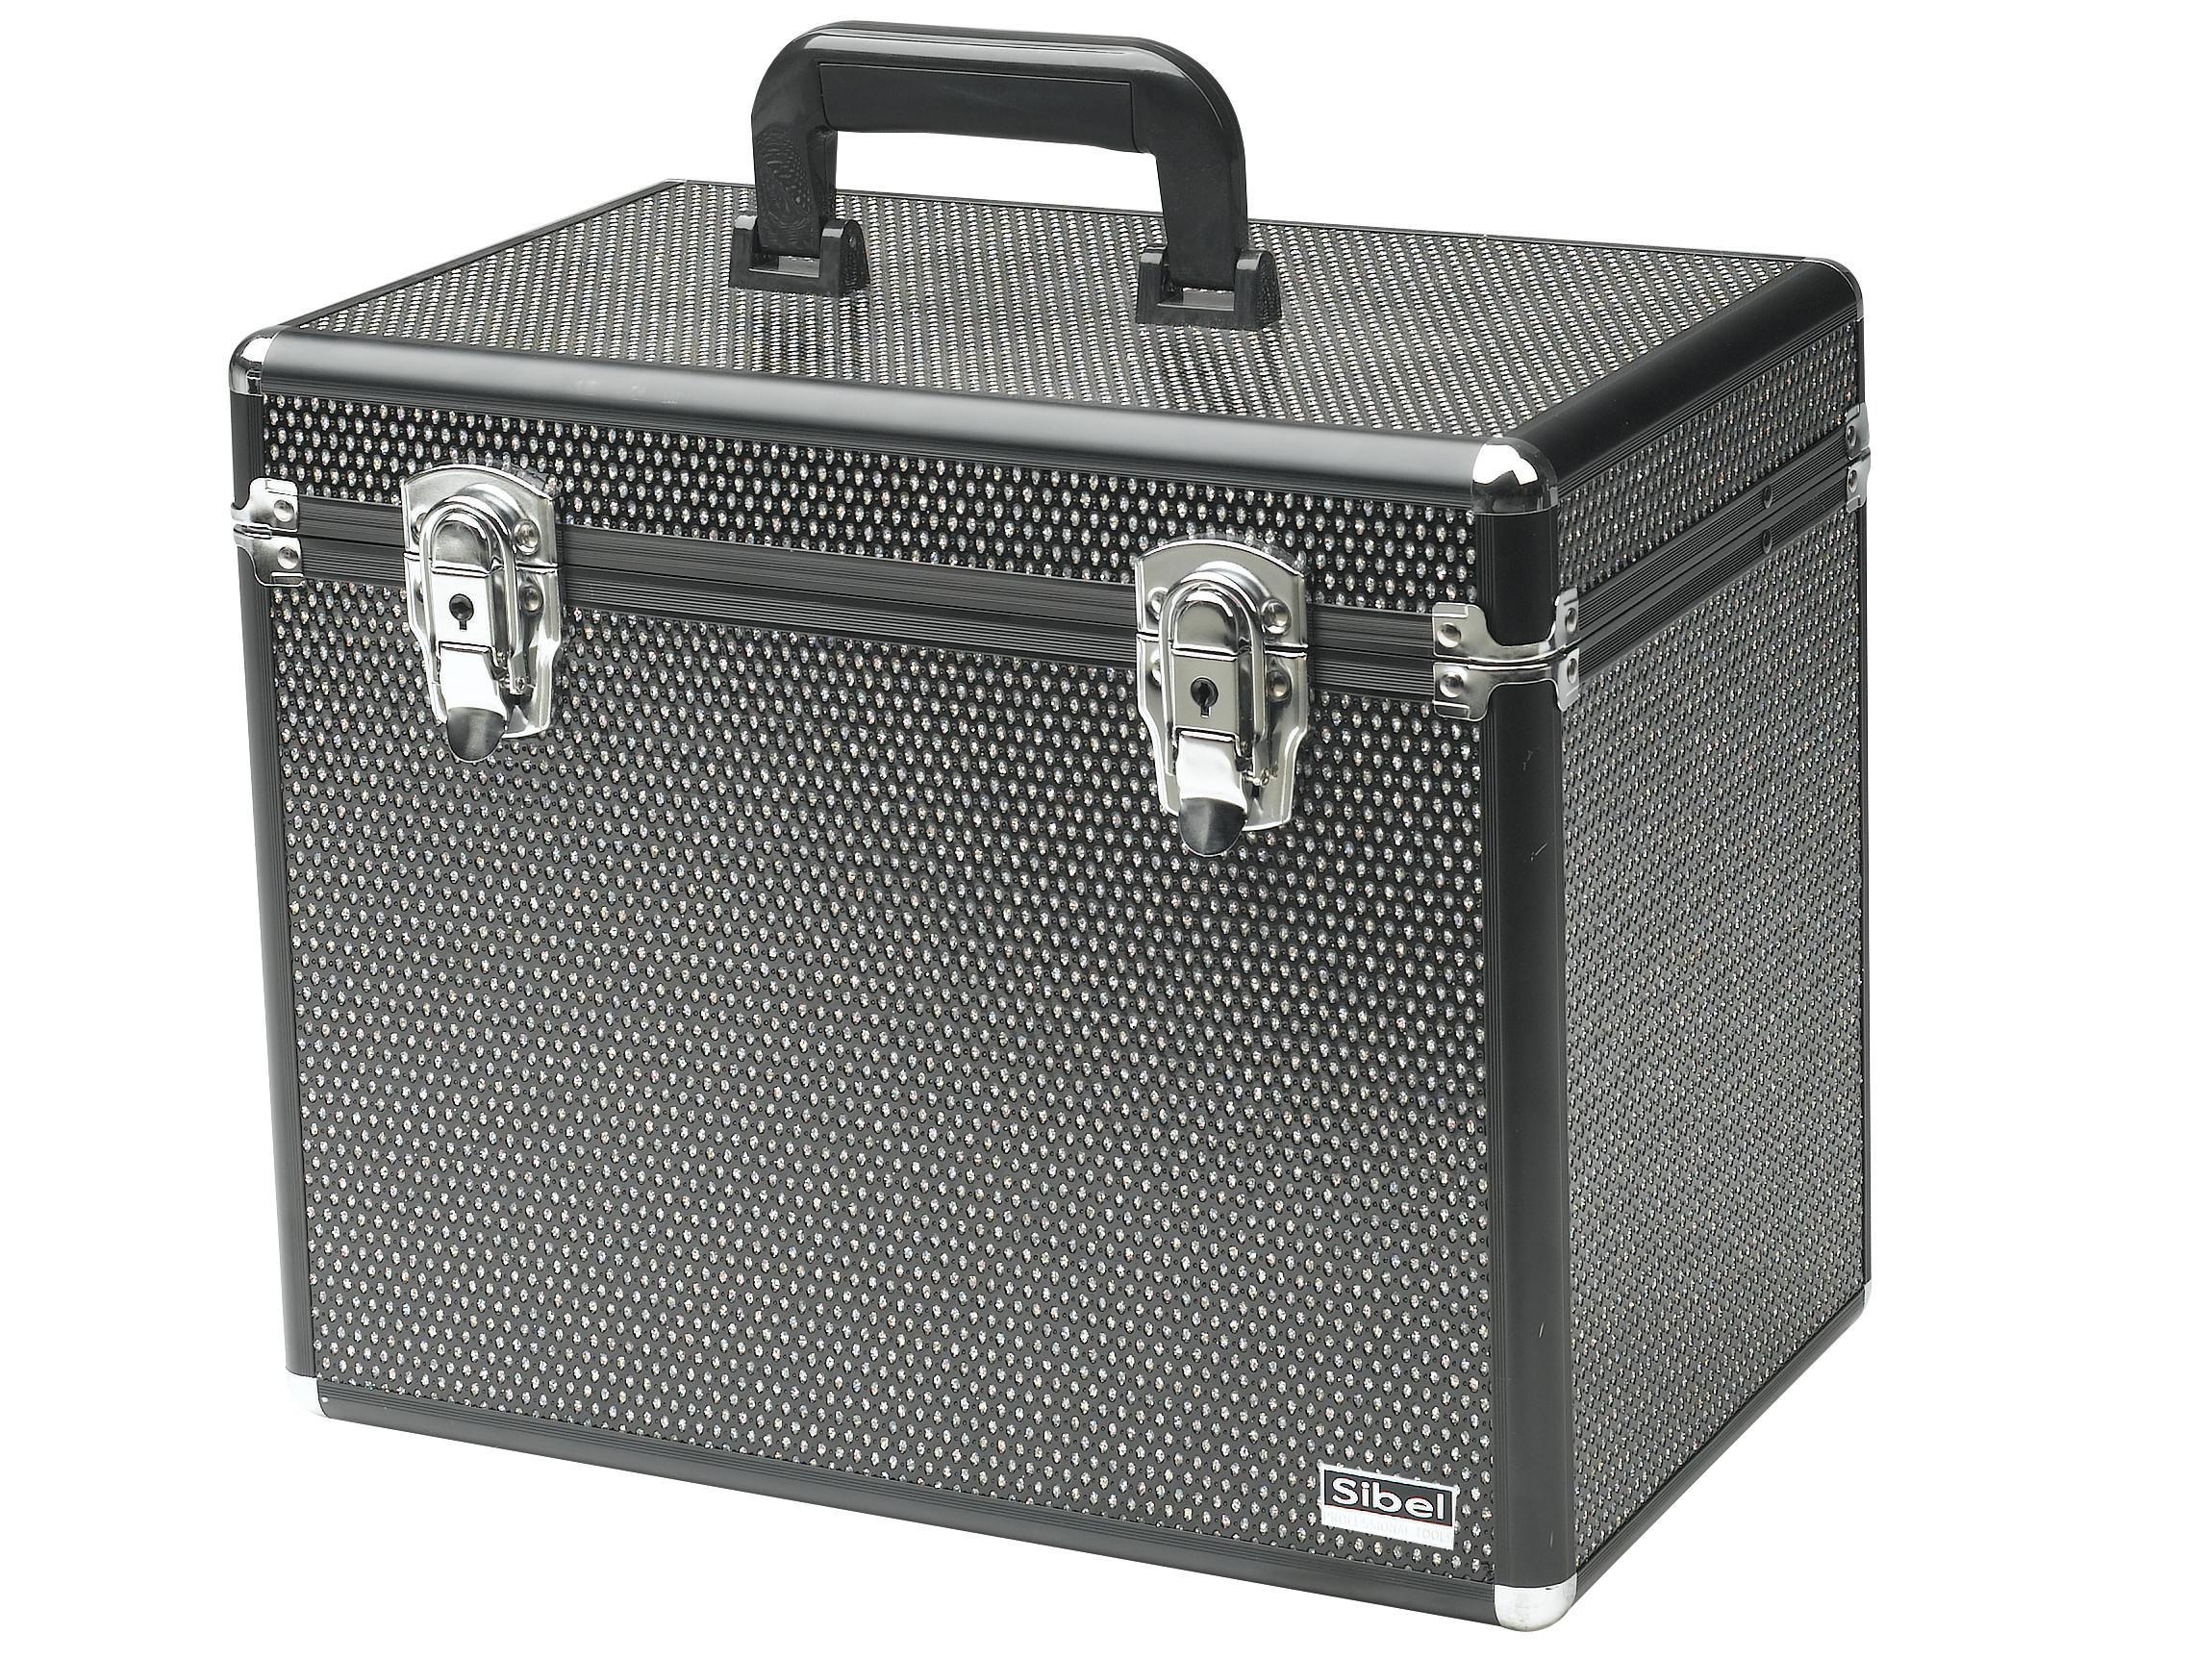 Kadeřnický a kosmetický kufr Sibel - černý (0150591) + DÁREK ZDARMA